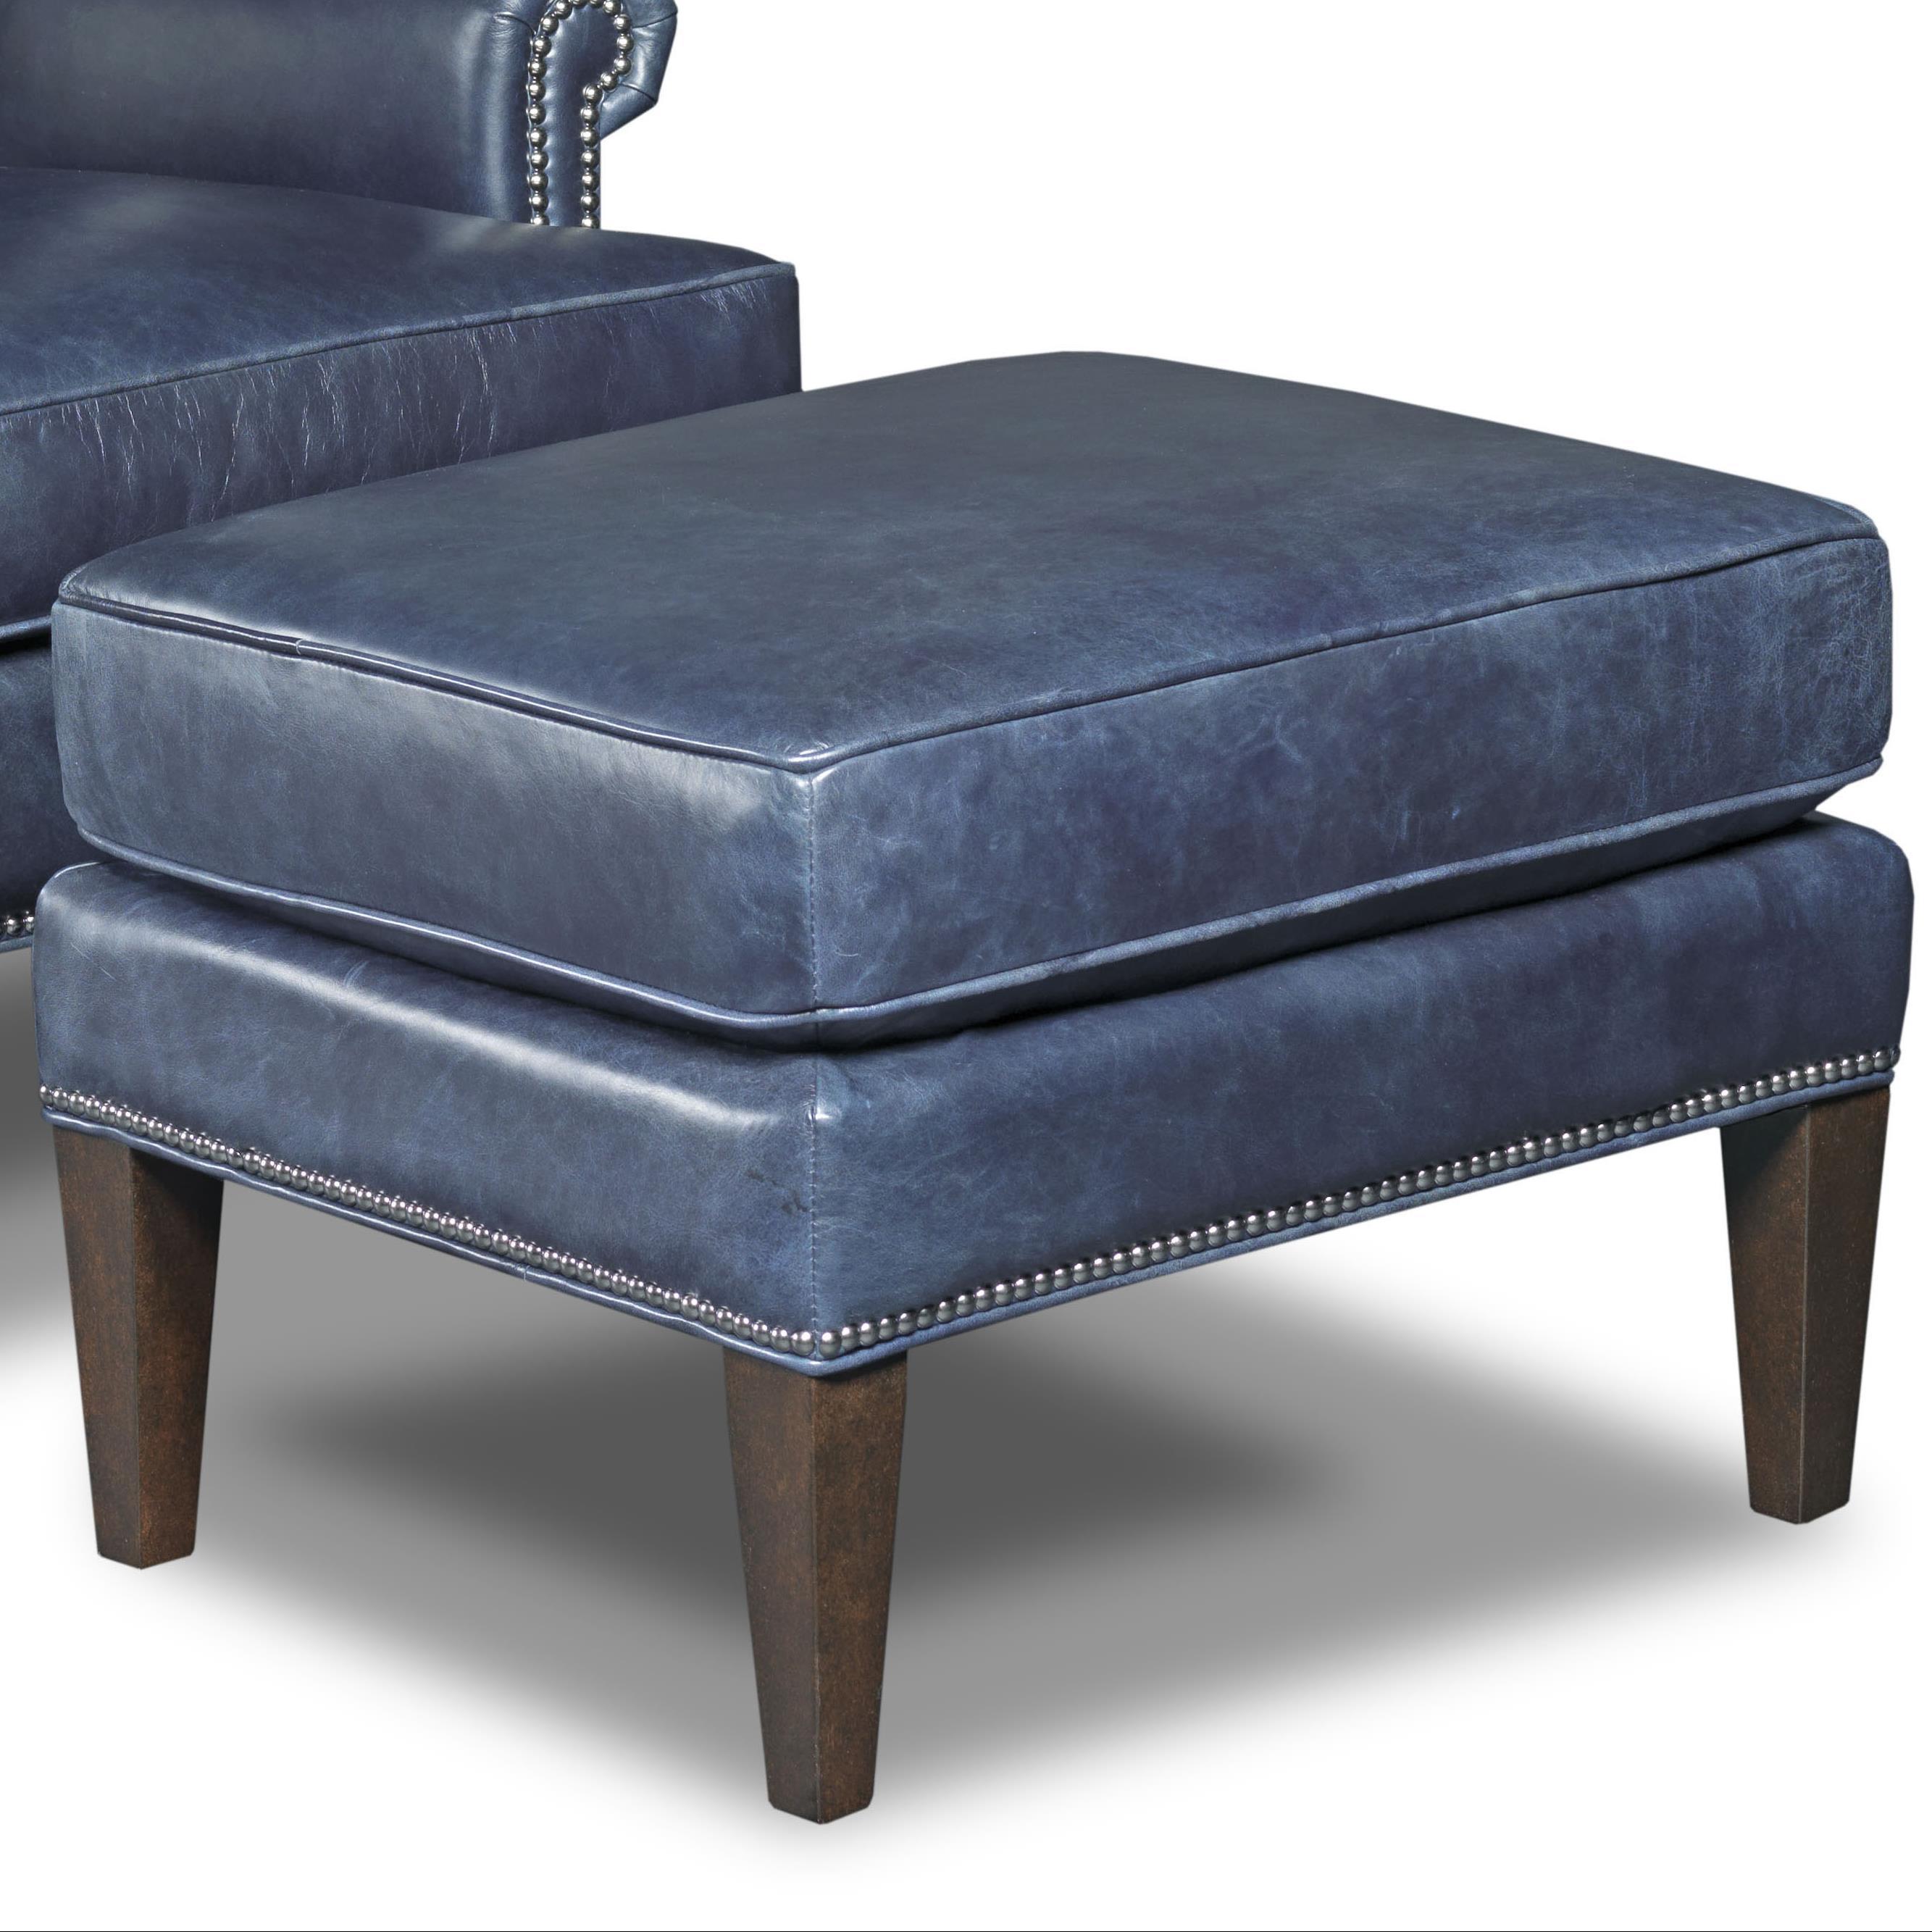 Hooker Furniture Club Chairs Ottoman With Nailhead Trim   Baeru0027s Furniture    Ottomans